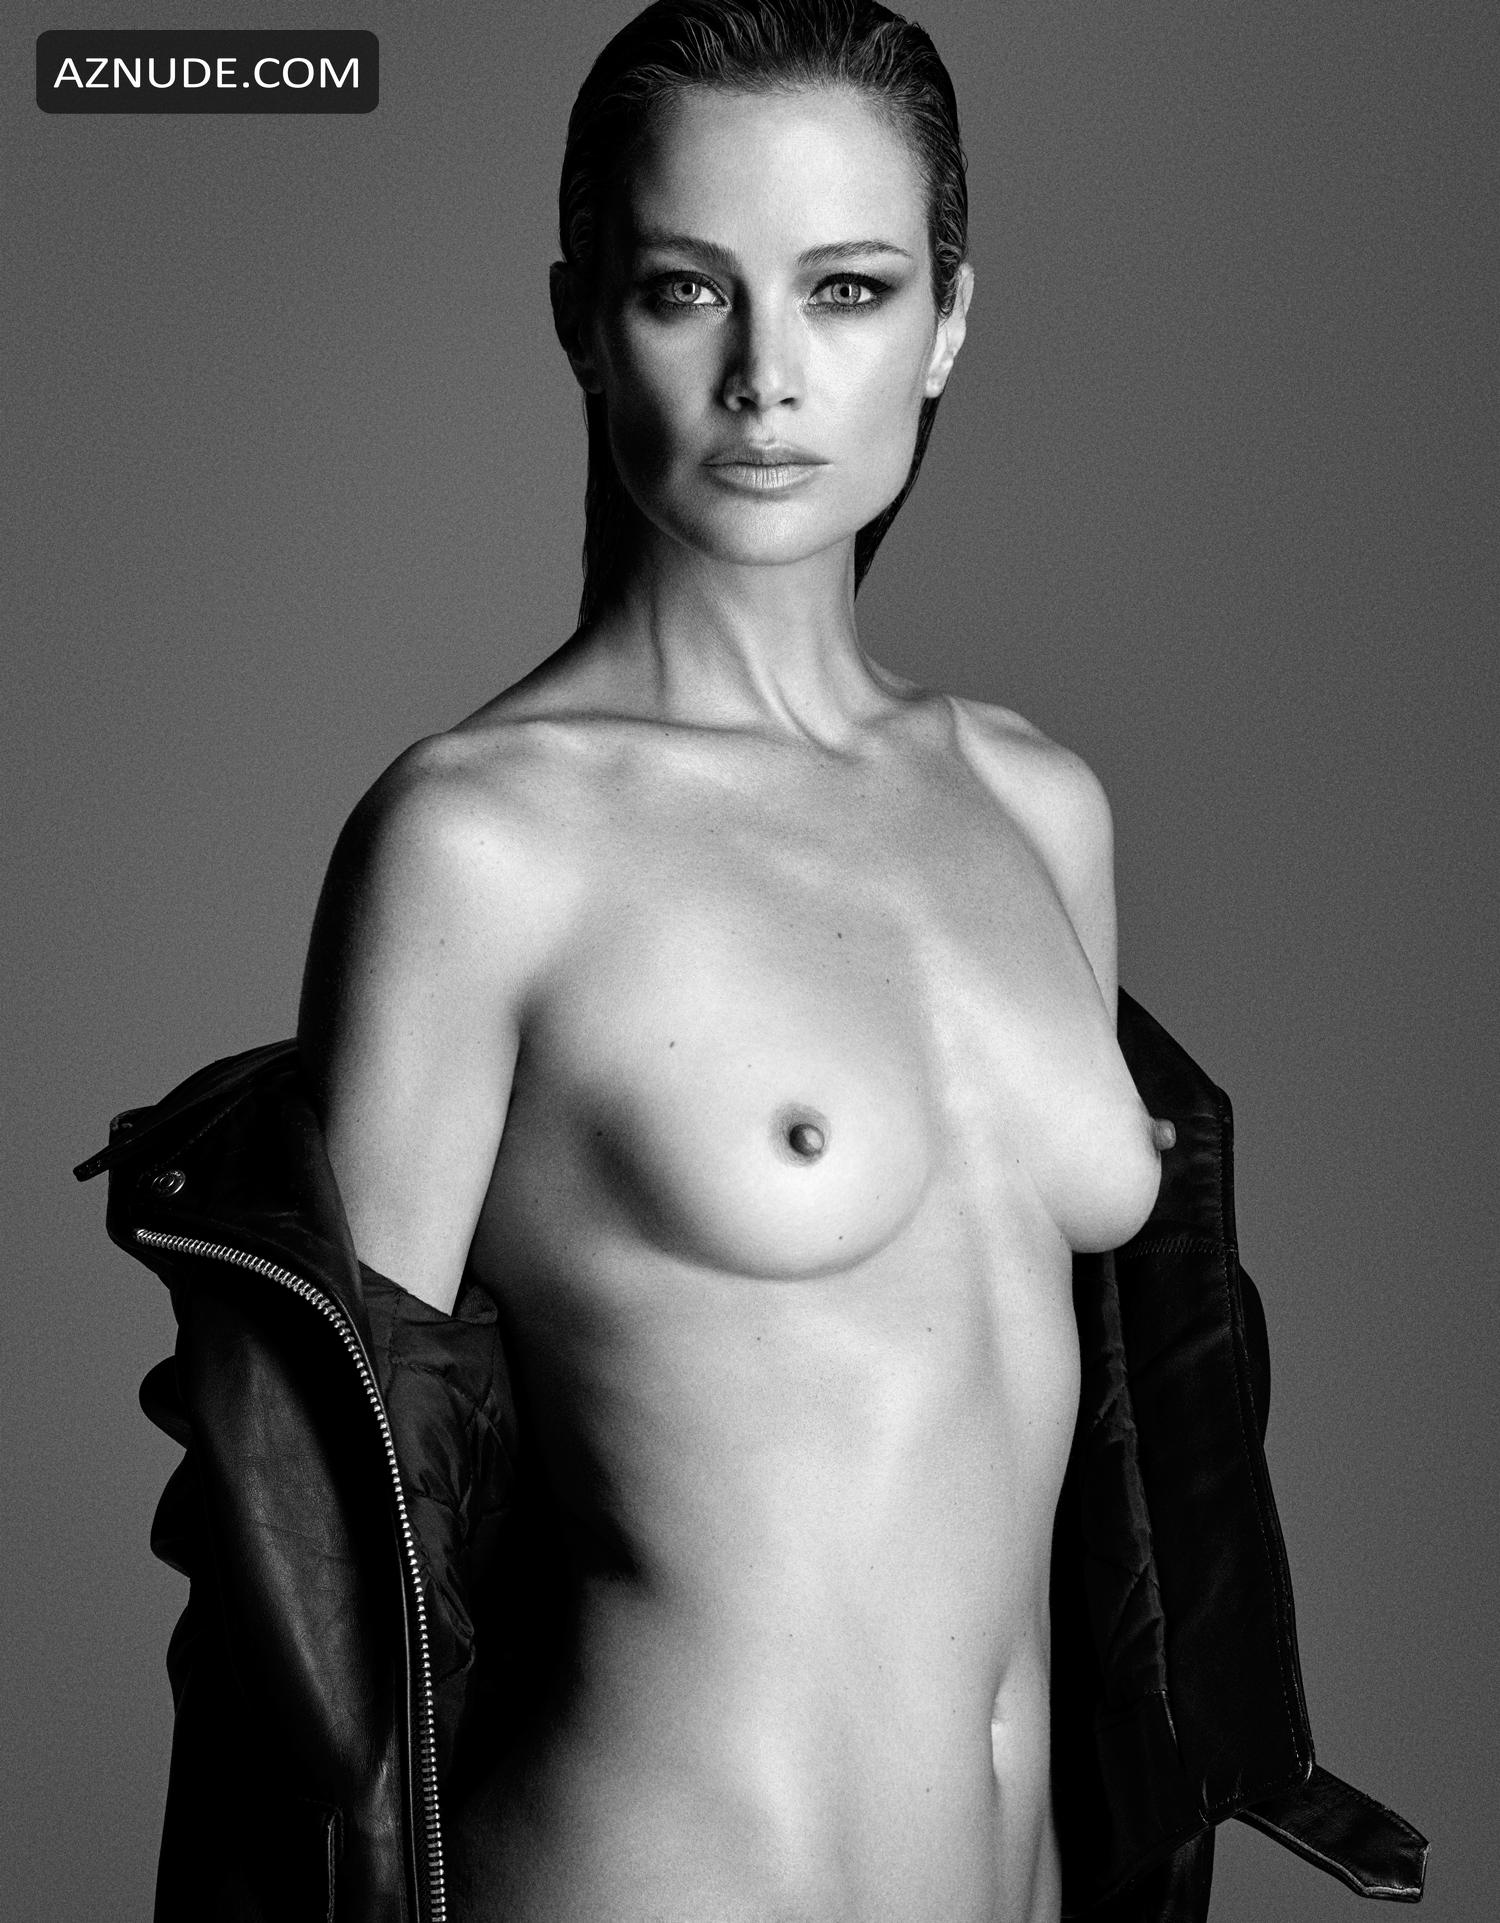 Mara krup nude photo galery